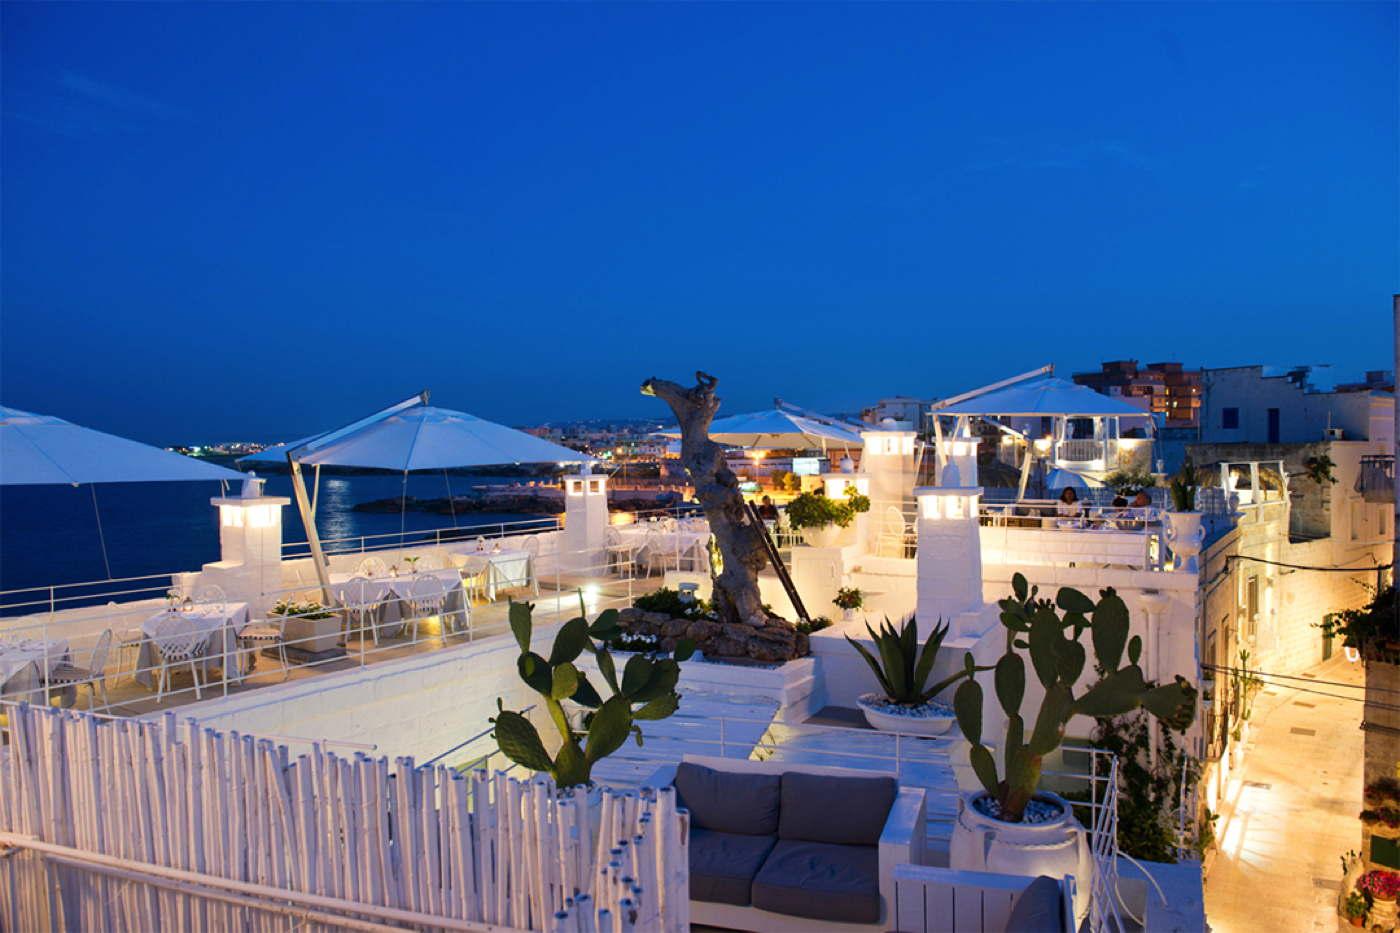 Design boutique hotel direkt am meer in apulien italien for Design hotels am meer